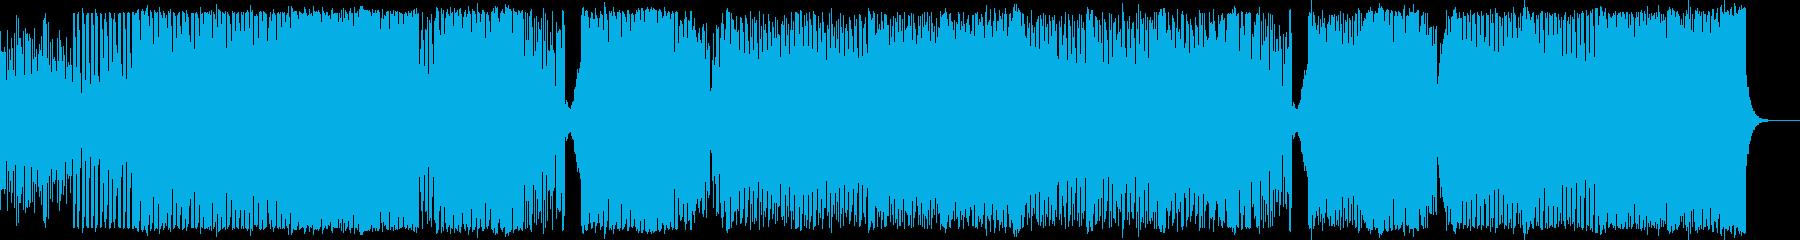 EDM風トラックの再生済みの波形